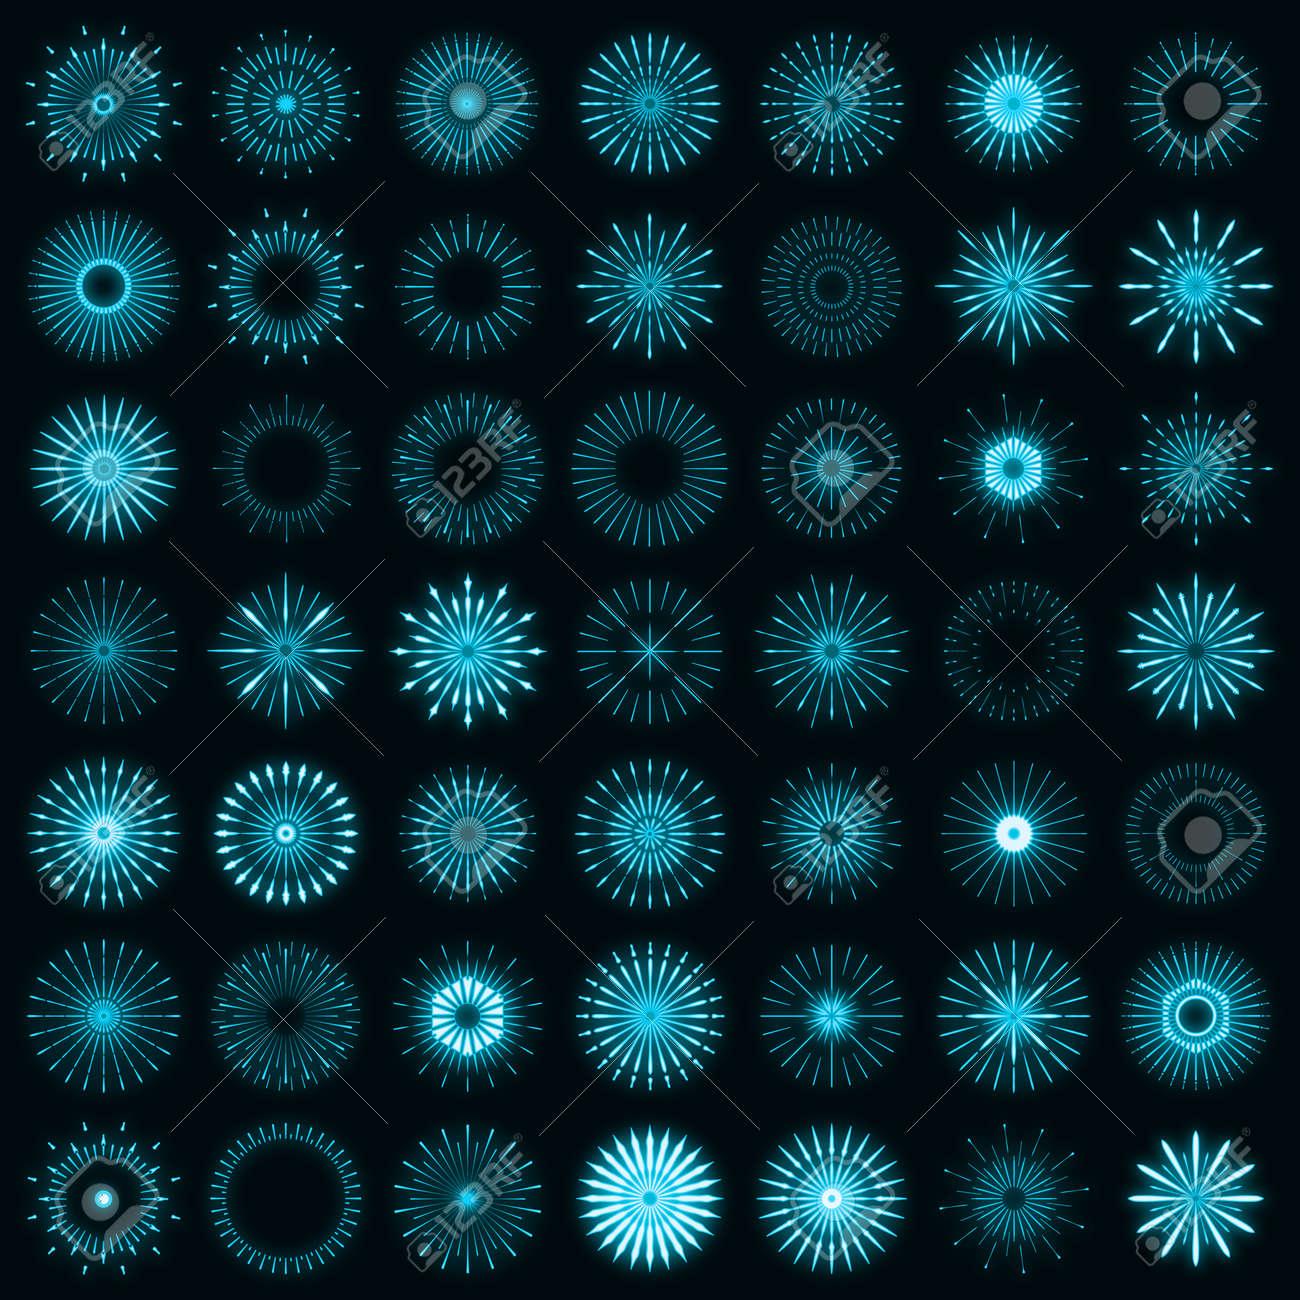 Retro set of light sunburst neon style glow geometric shape, vintage rays sunlight explosion icon concept vector illustration, isolated on black wall. Minimal blue firework burst label, sunbeam badge. - 168394789